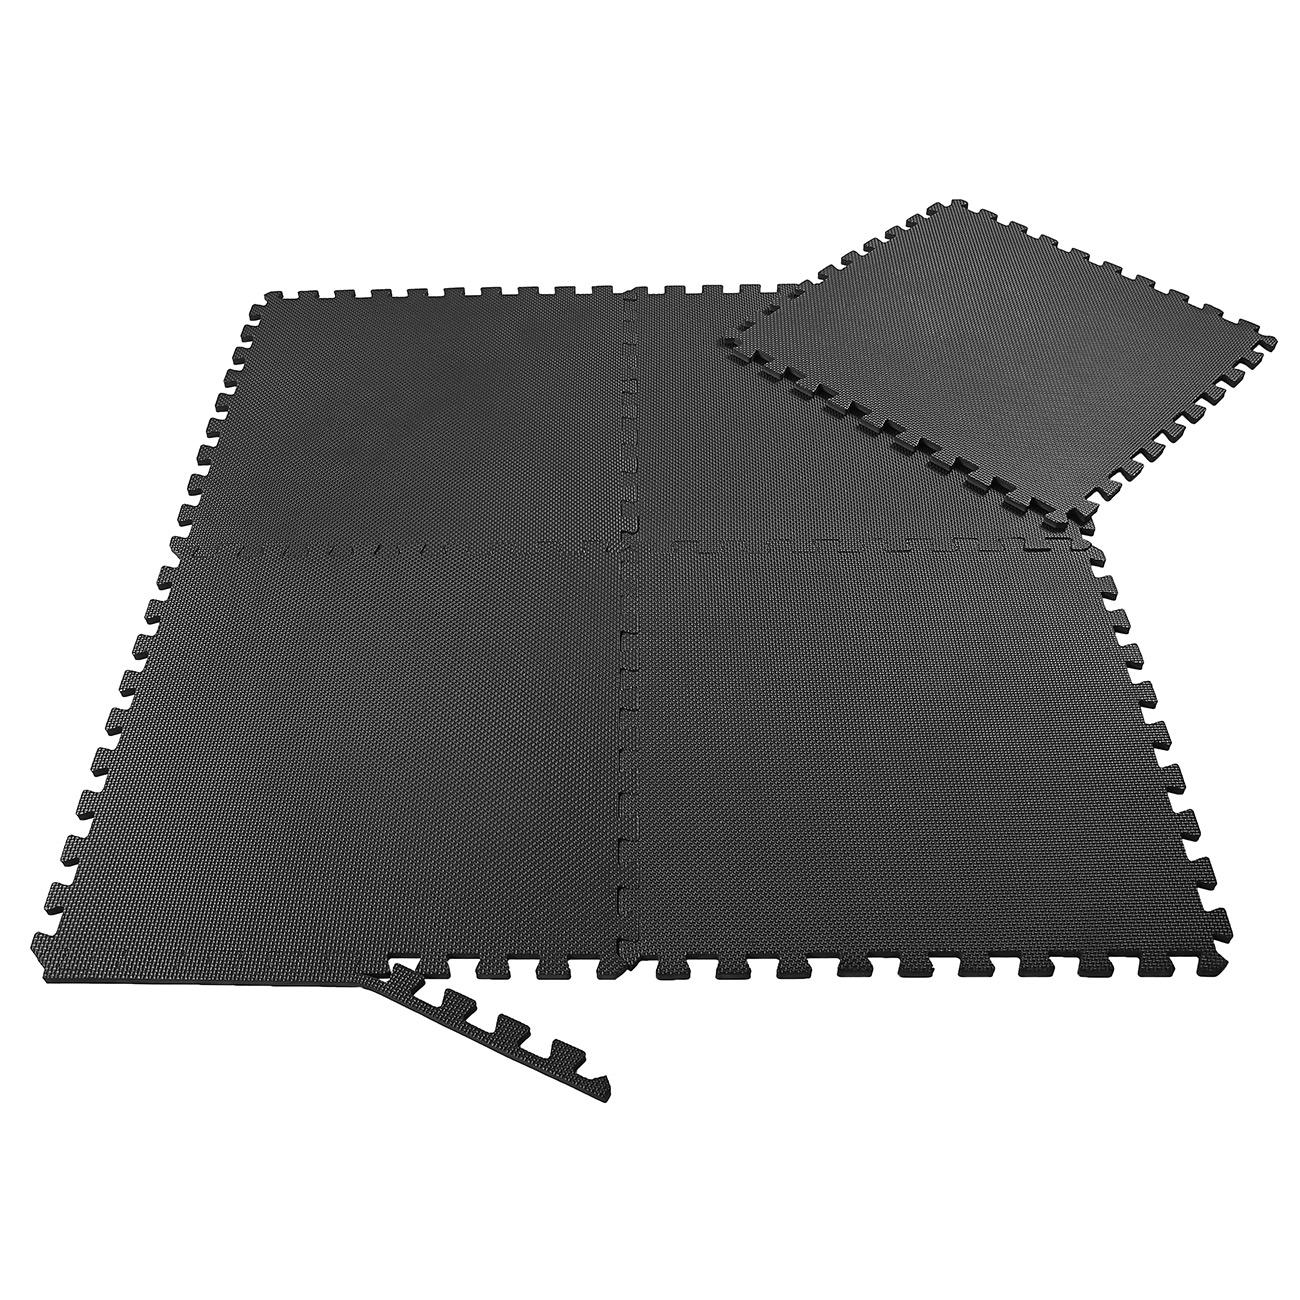 Tapis de piscine Tapis de sol Tapis de protection de sol 60 x 60 cm Tapis de protection puzzle Tapis de sol pour protection du sol Tapis de sol salle de gym bureau